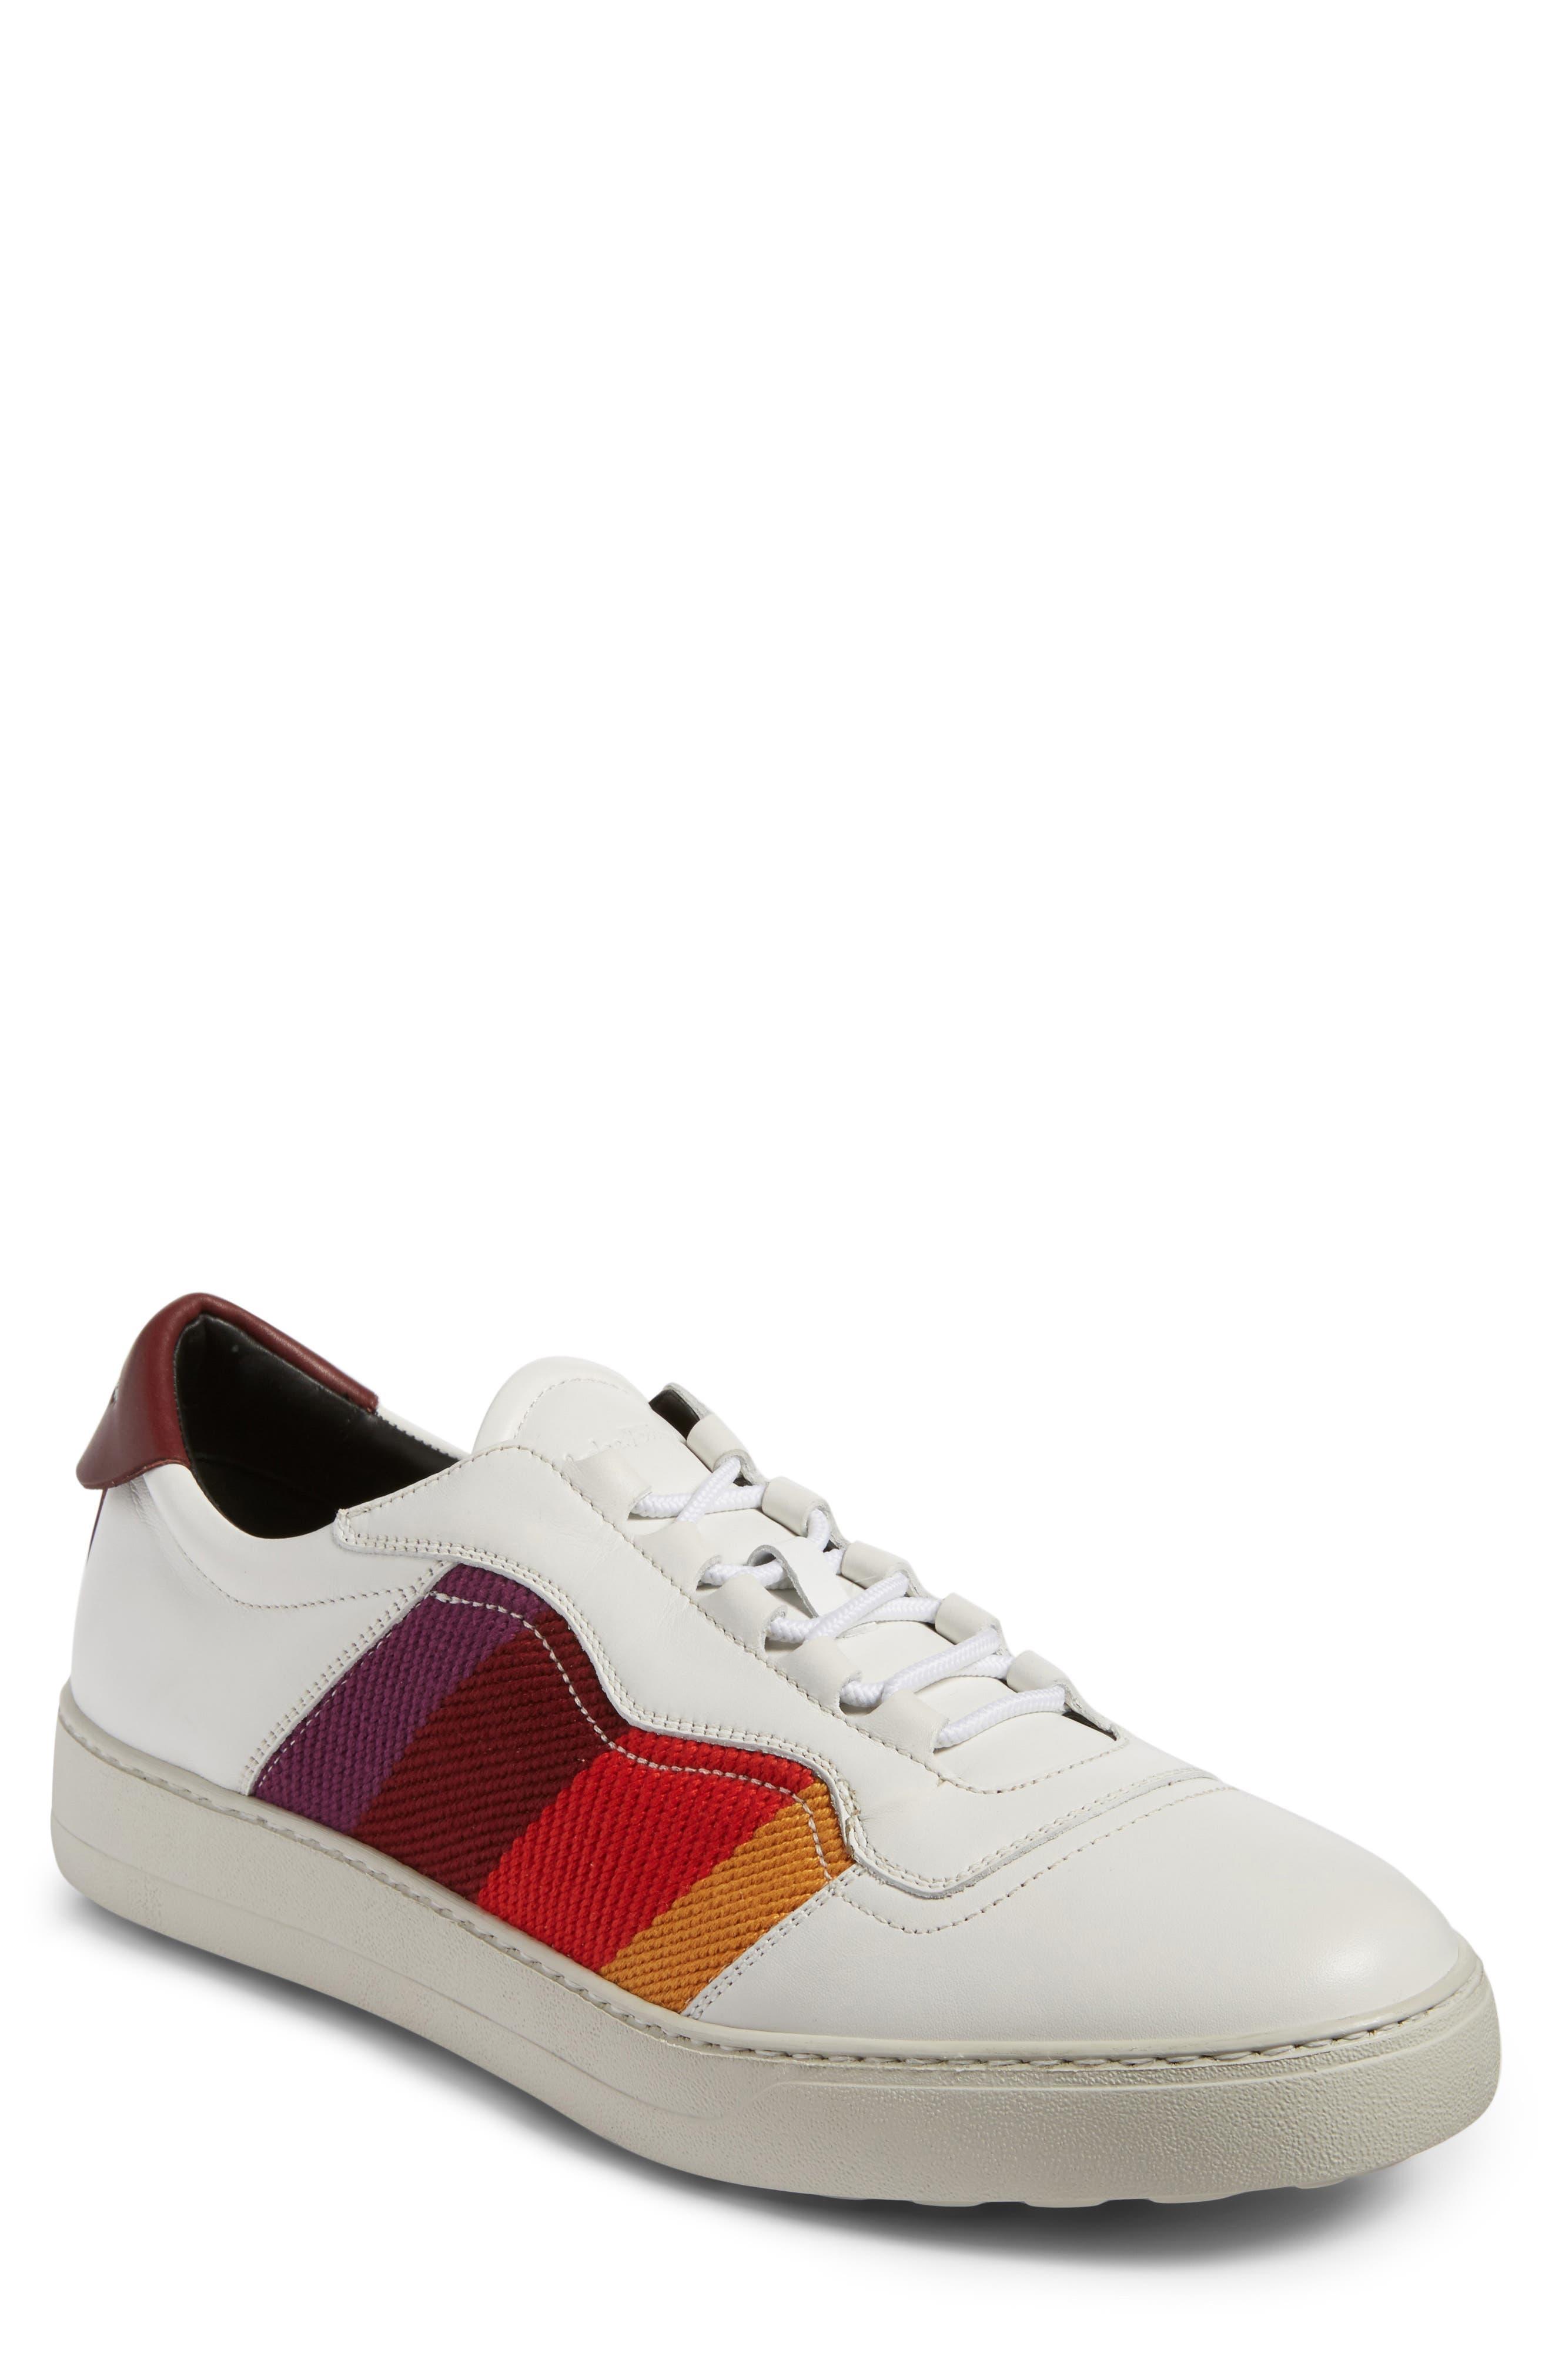 Salvatore Ferragamo Sneaker (Men)